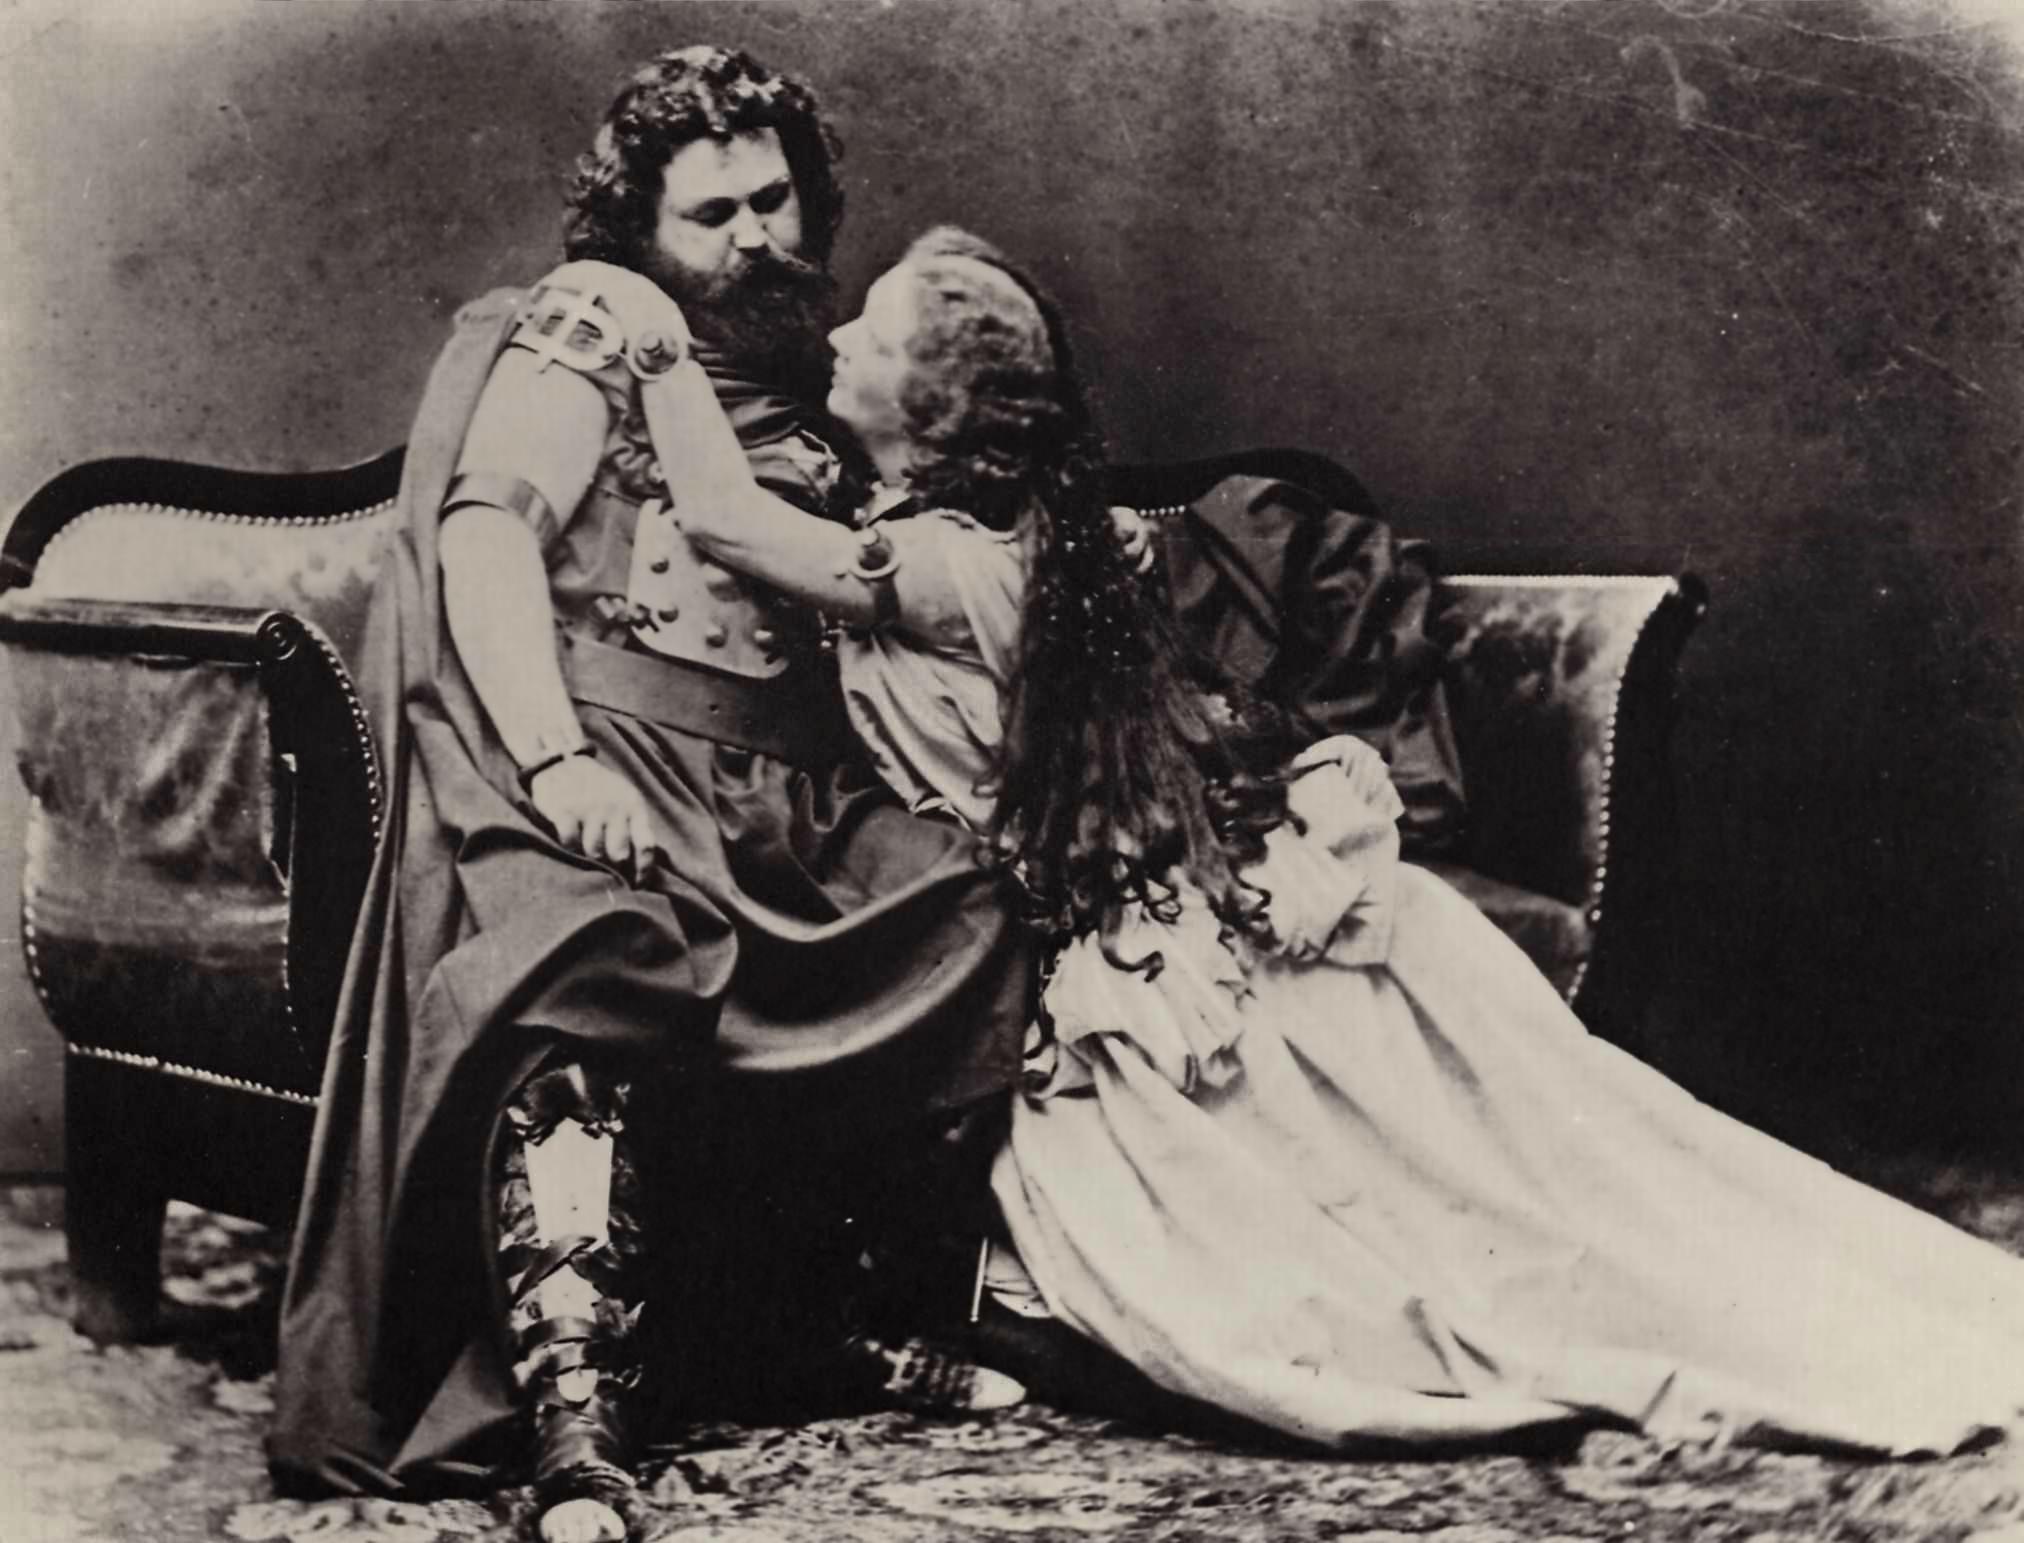 Ludwig Schnorr von Carolsfeld and his wife Malwina were Wagner's original Tristan and Isolde in 1865. Joseph Albert/Wikimedia Commons